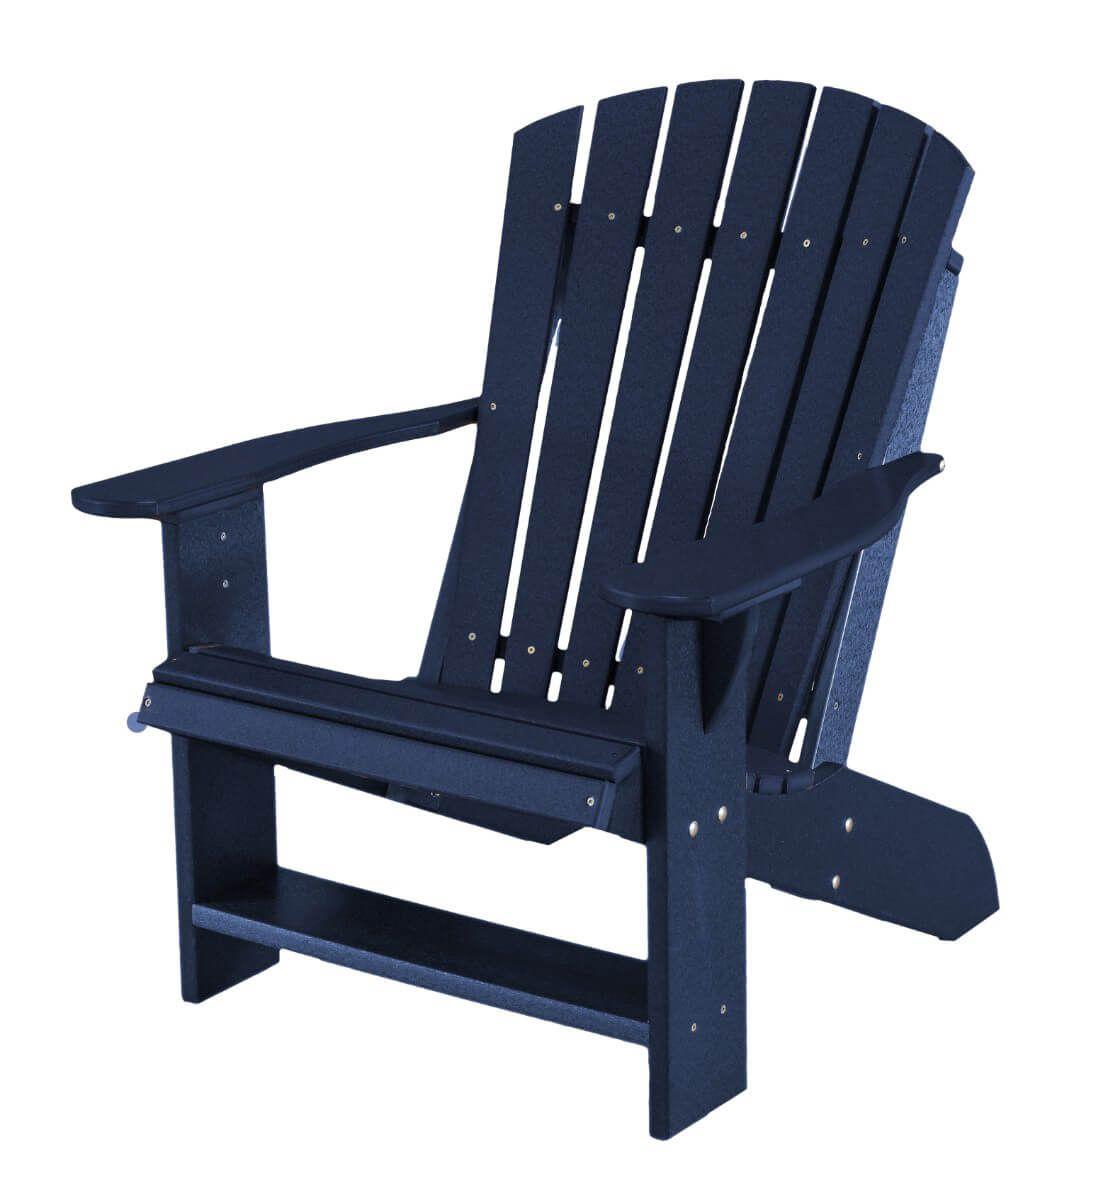 Patriot Blue Sidra Adirondack Chair